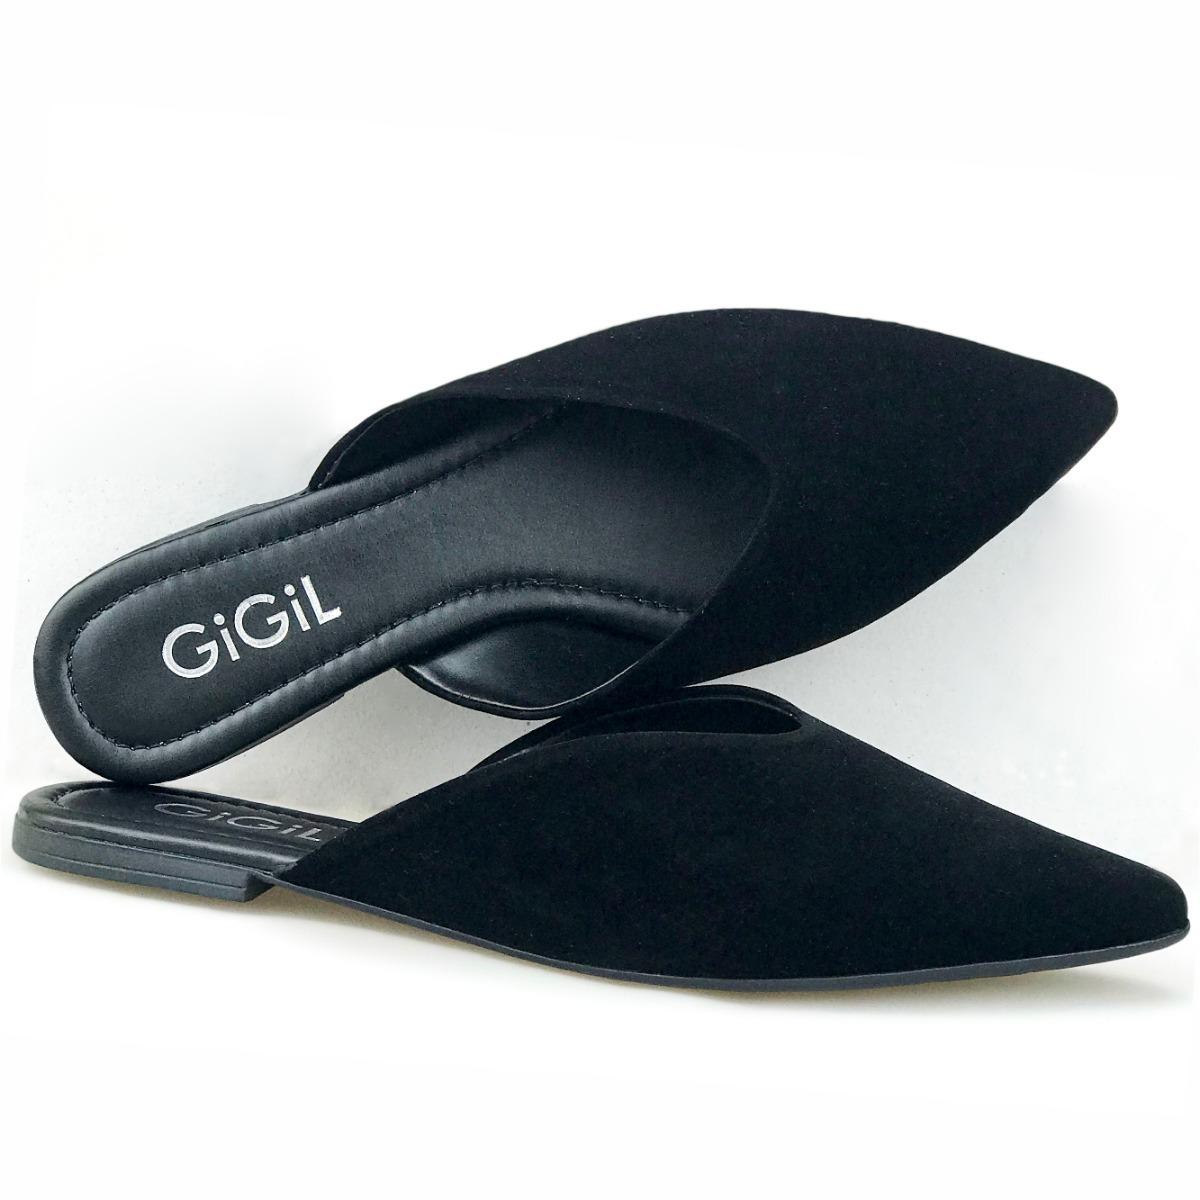 c51707457f Sapato Feminino Mule Sapatilha Bico Fino Rasteirinha 2019 - R  34